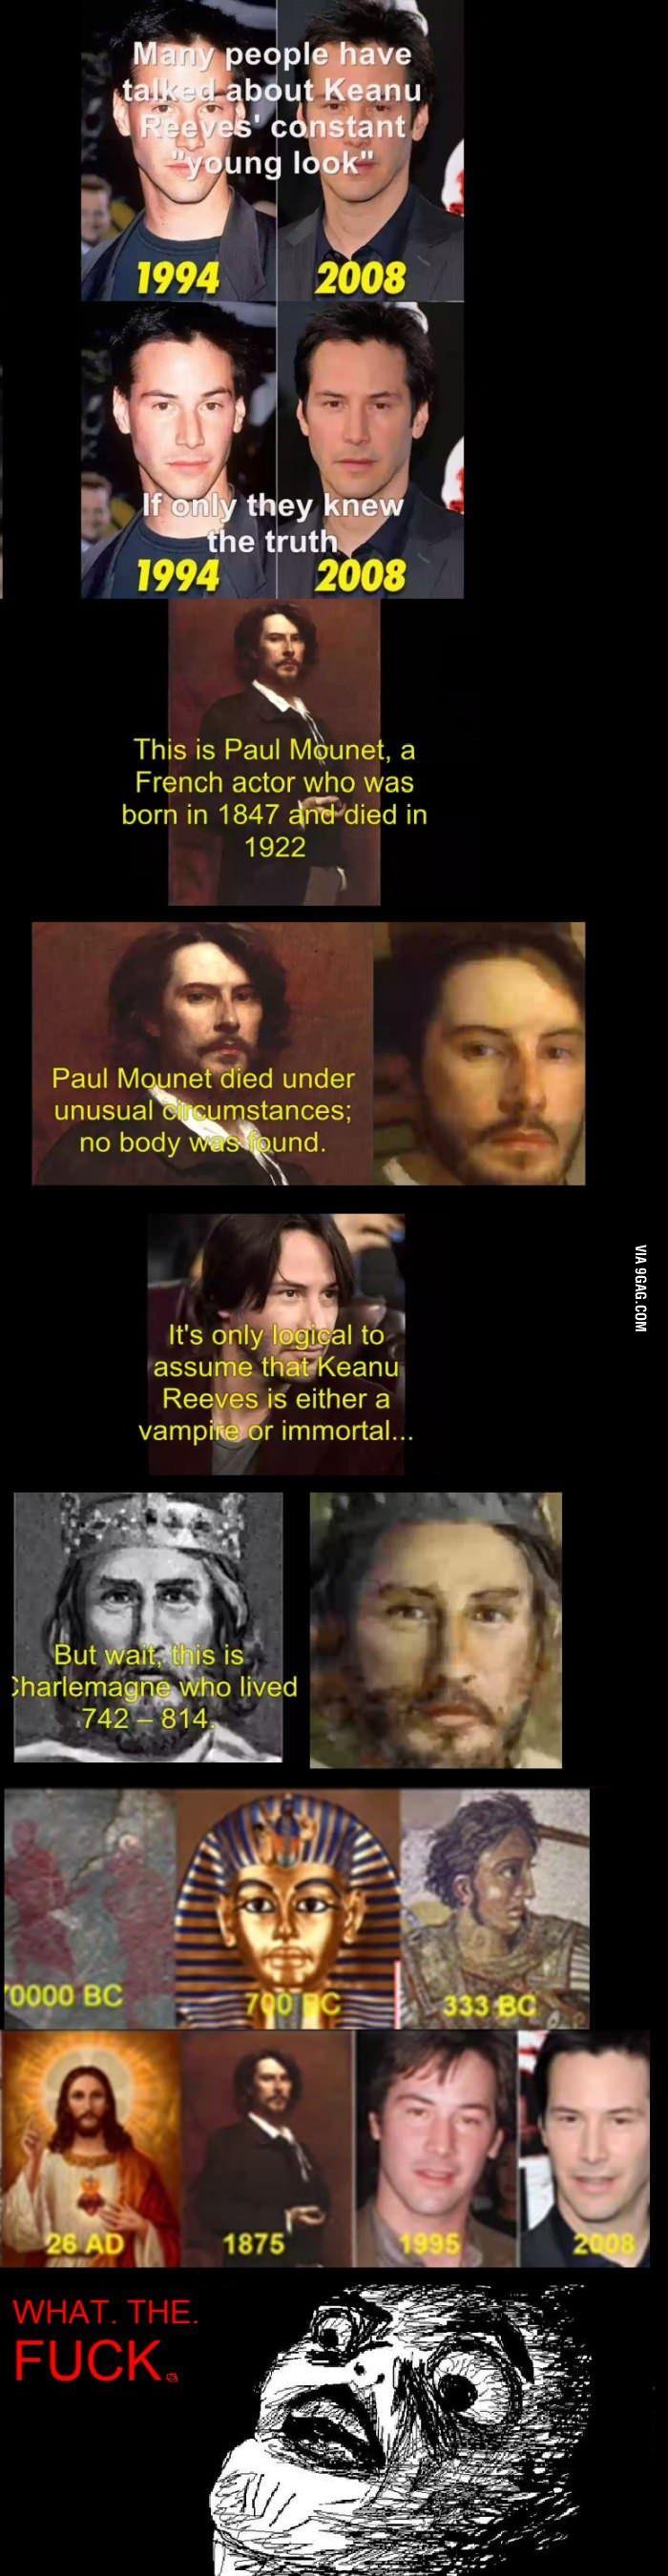 The immortal Keanu Reeves.